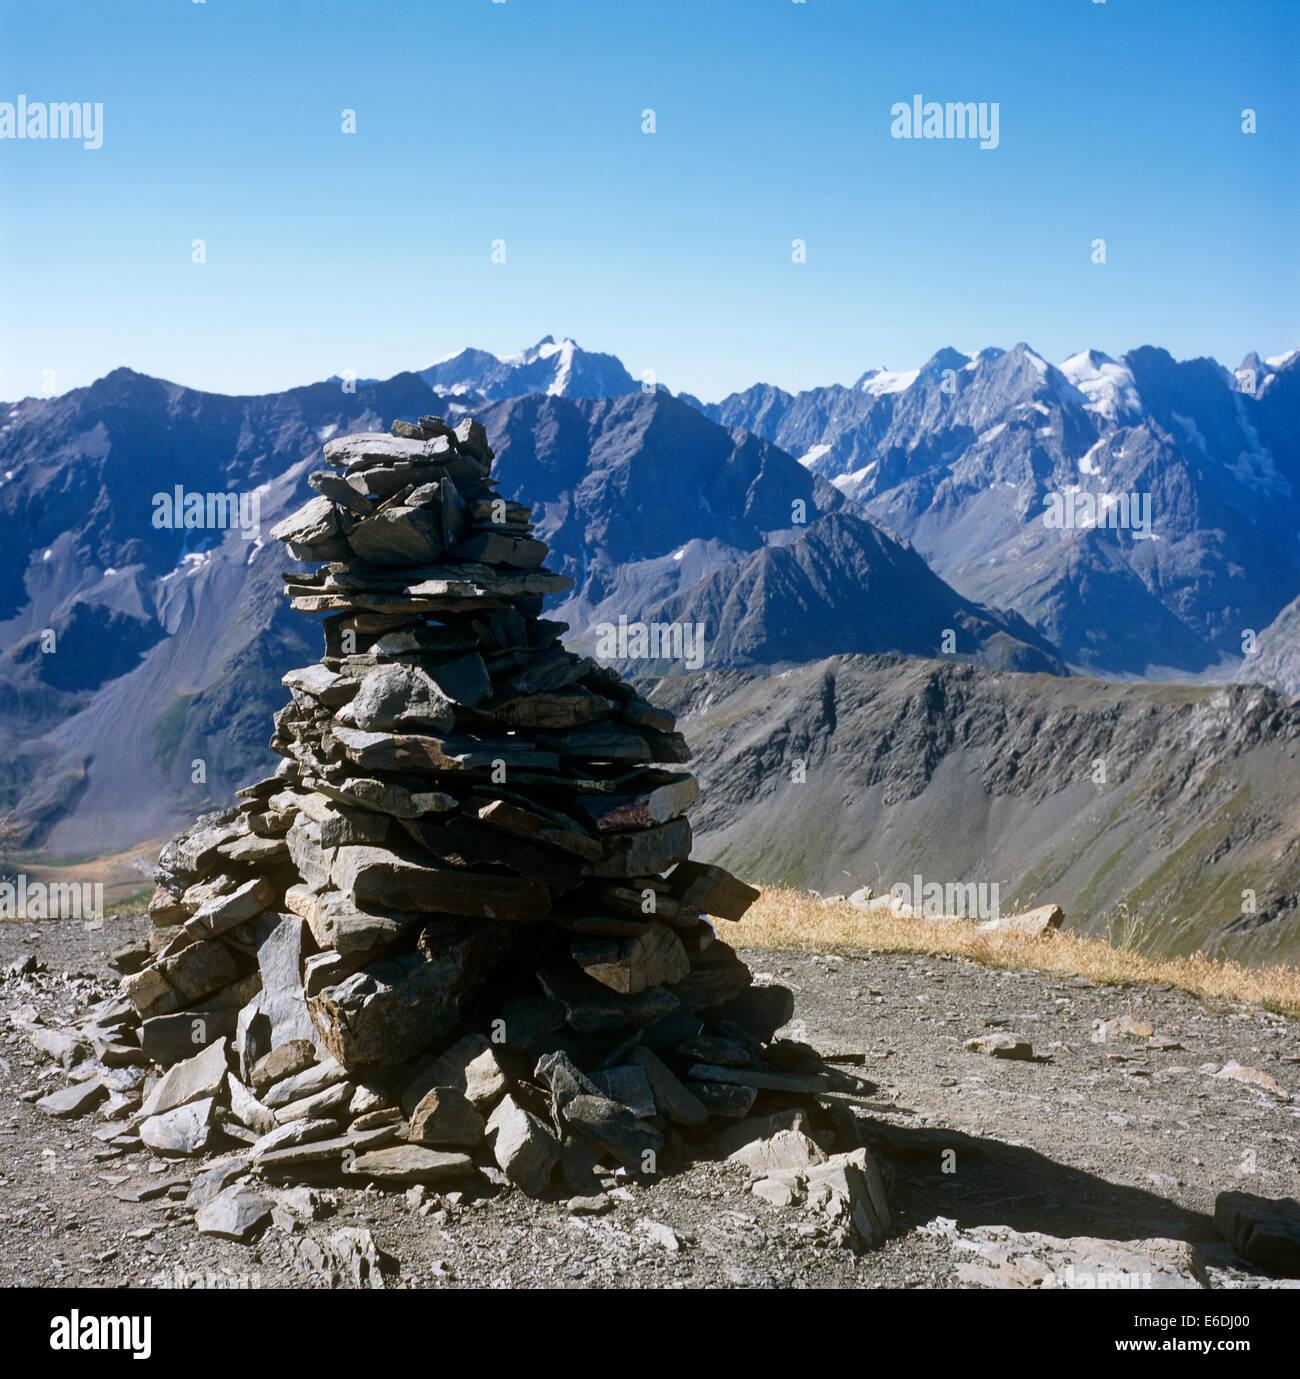 Cairn on Pie de Galibier Savoie France - Stock Image